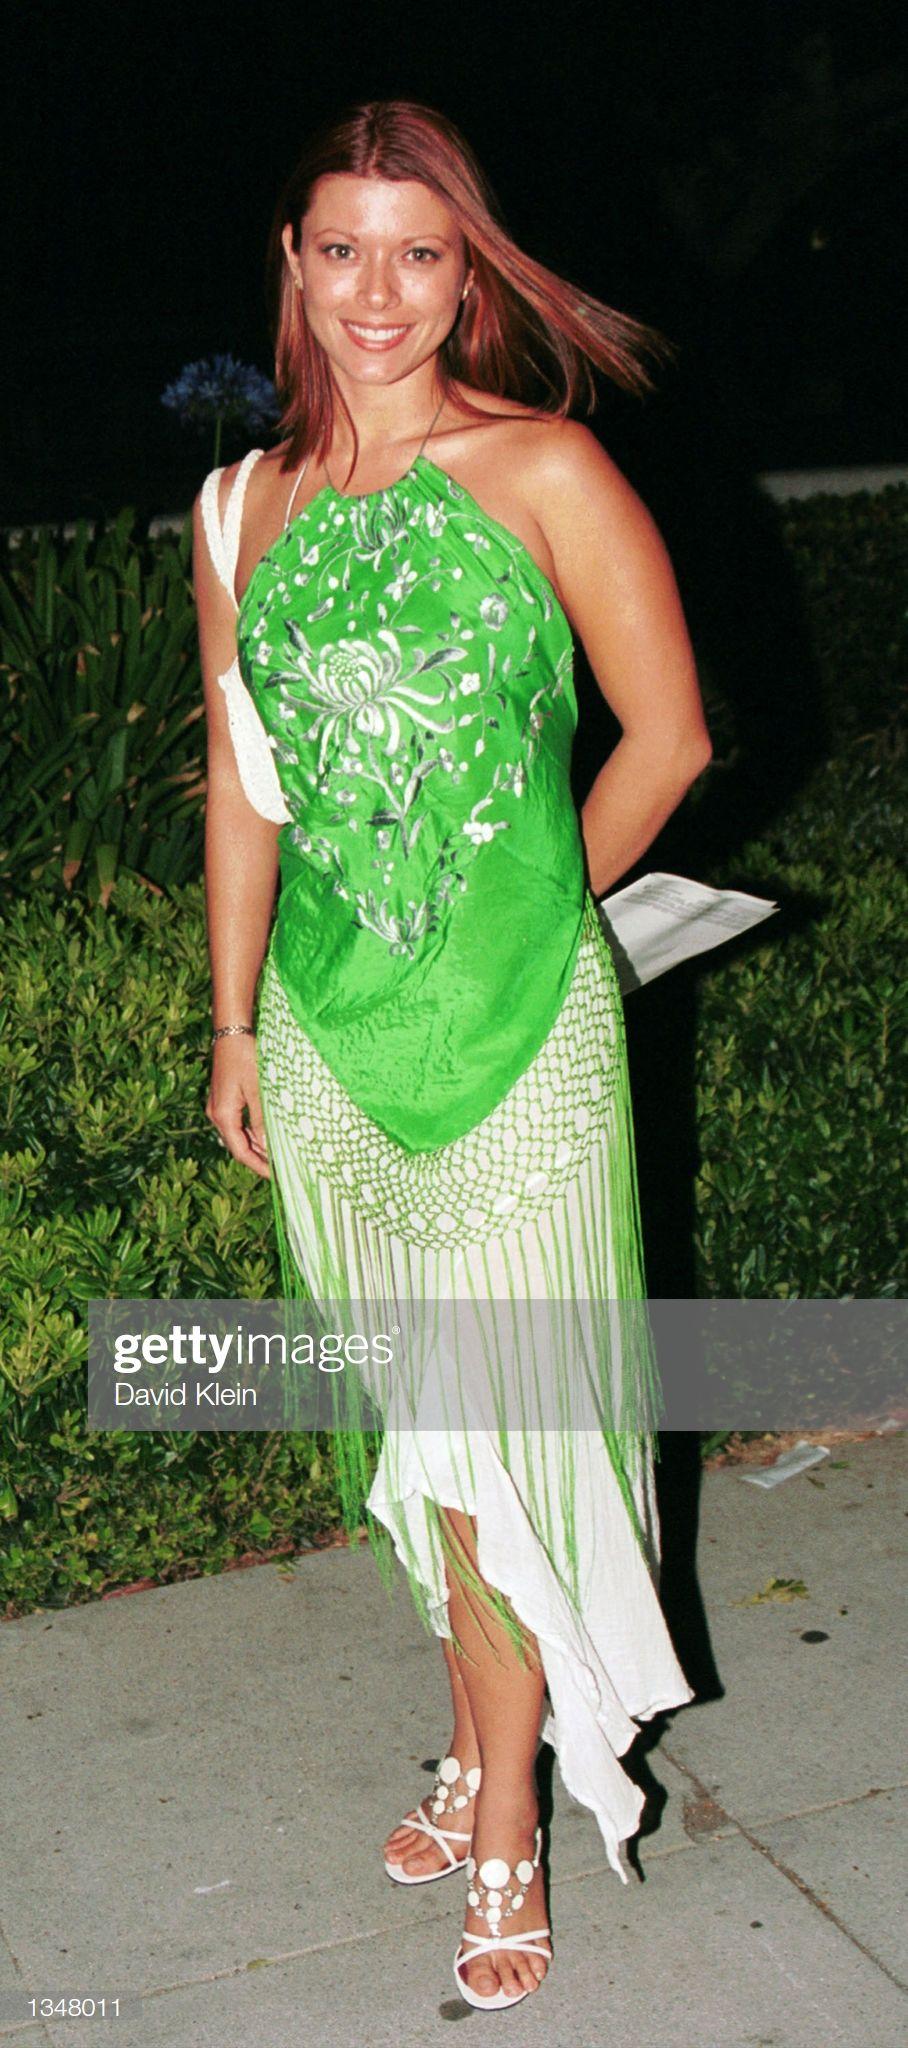 Angel Boris news photo : model angel boris attends the premiere party